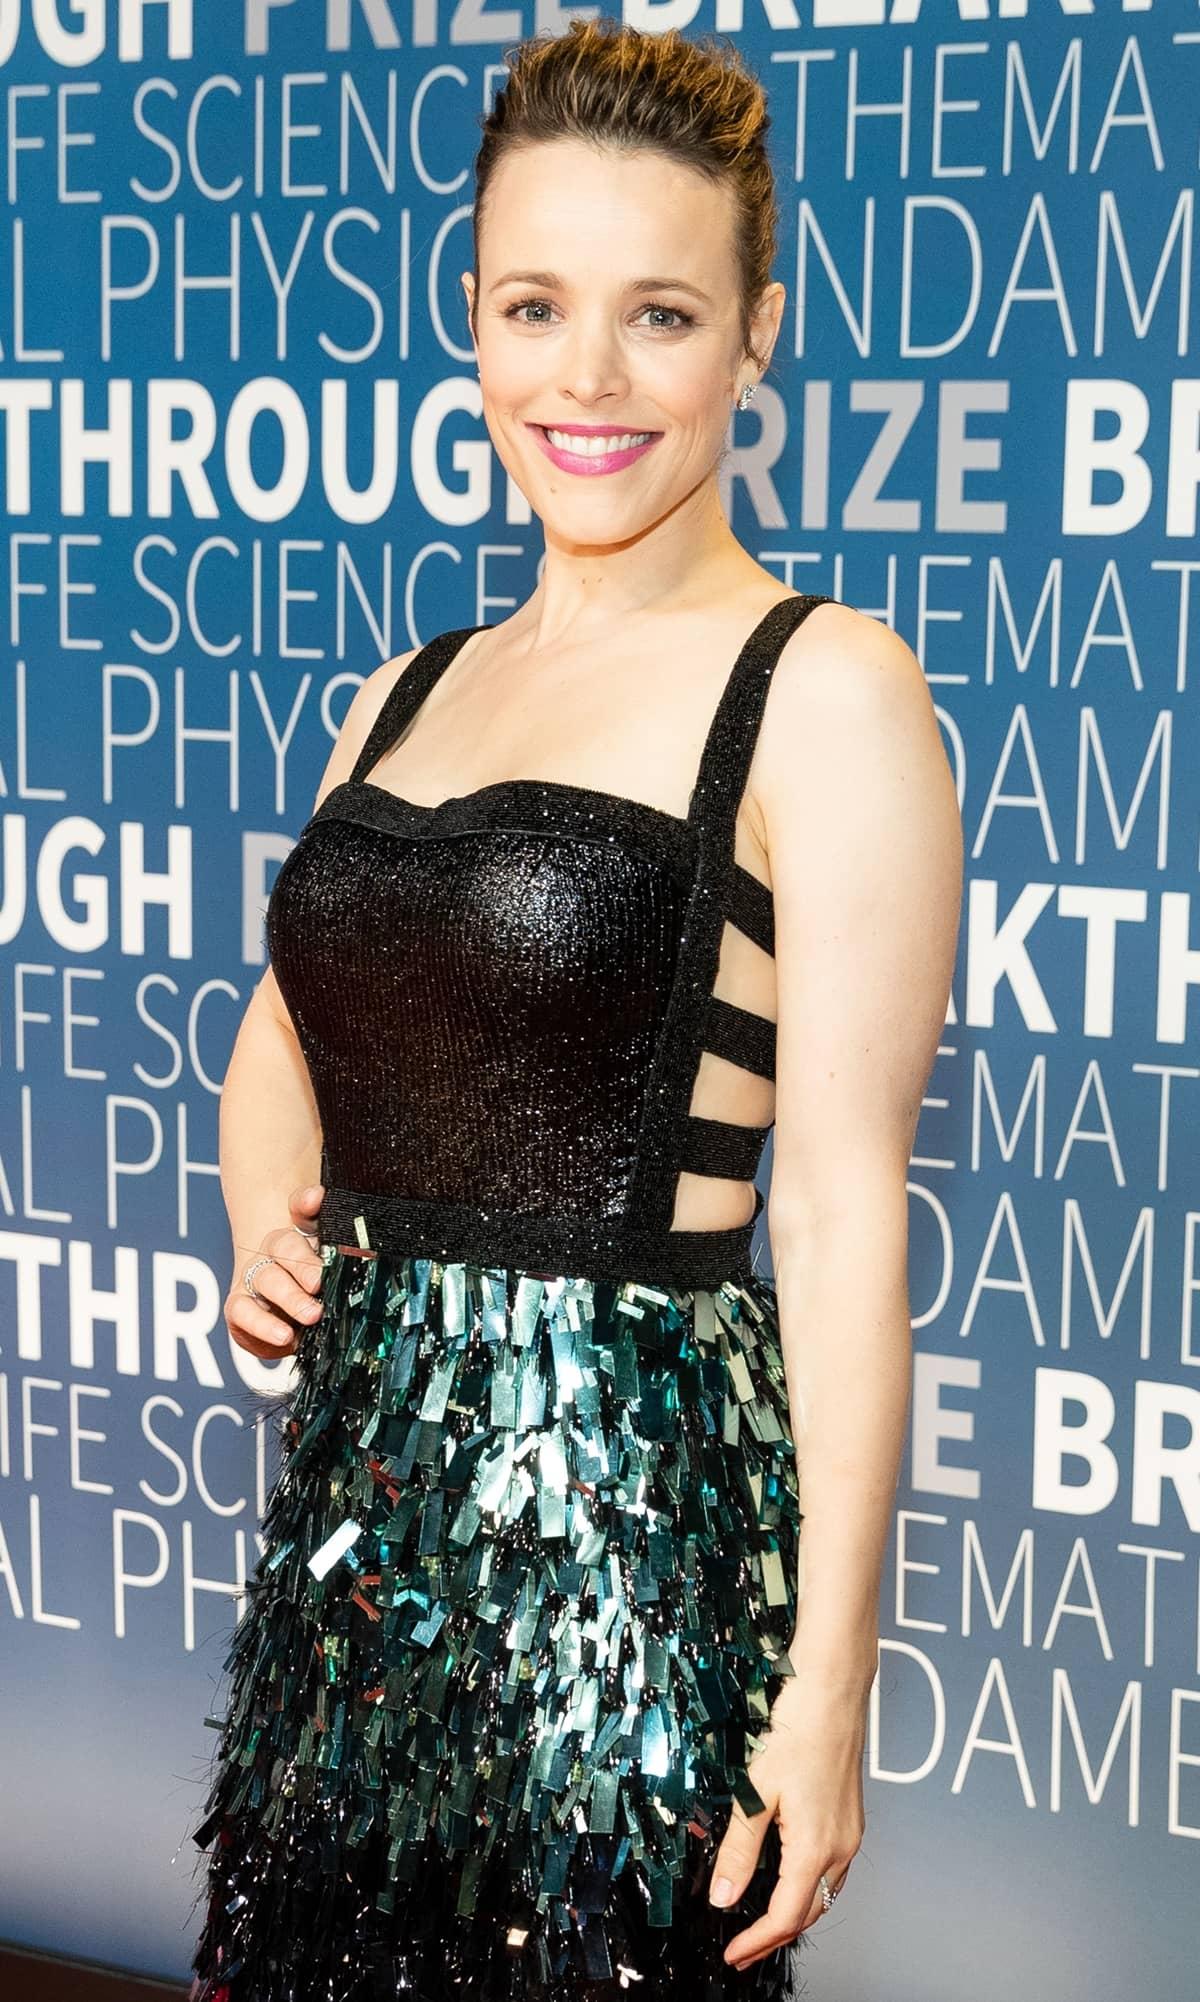 Rachel McAdams looks stunning in a Rami Kadi Couture dress with metallic sequin appliqués and Hearts On Fire jewelry